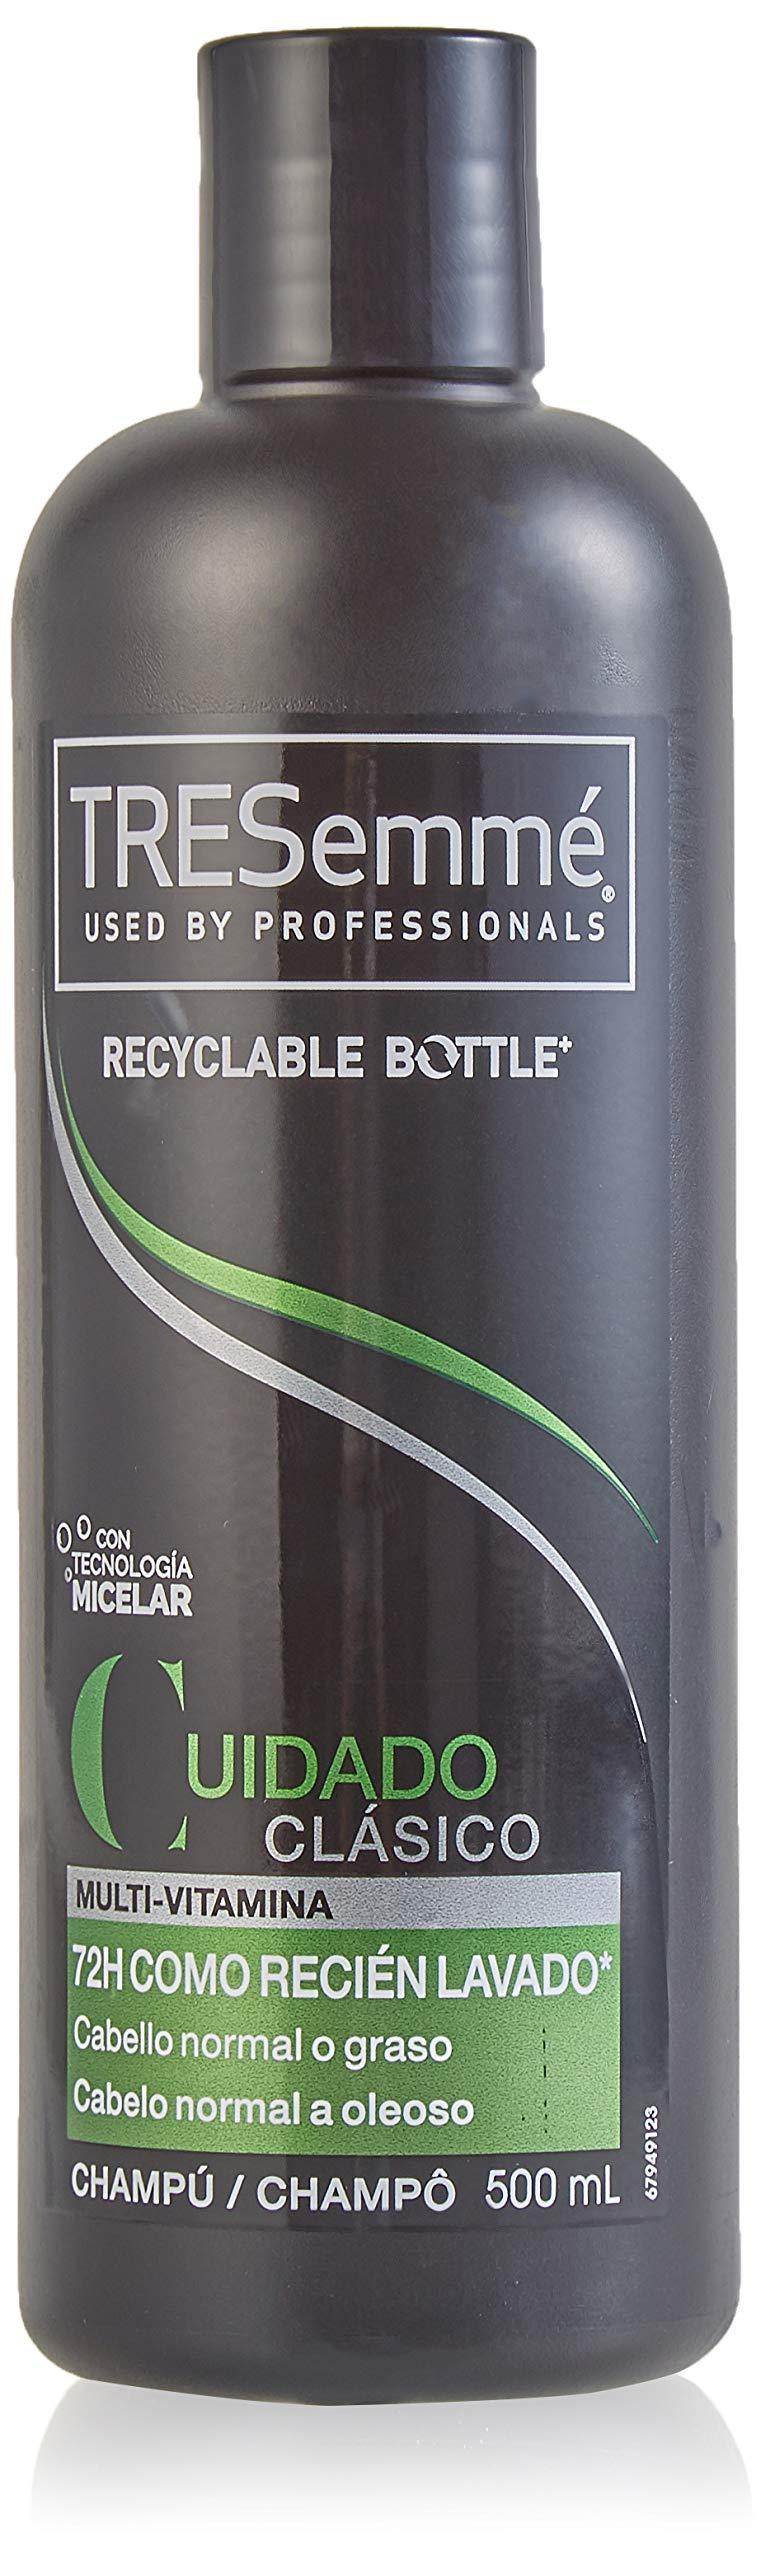 TRESemmé Champú Clásico - 500 ml